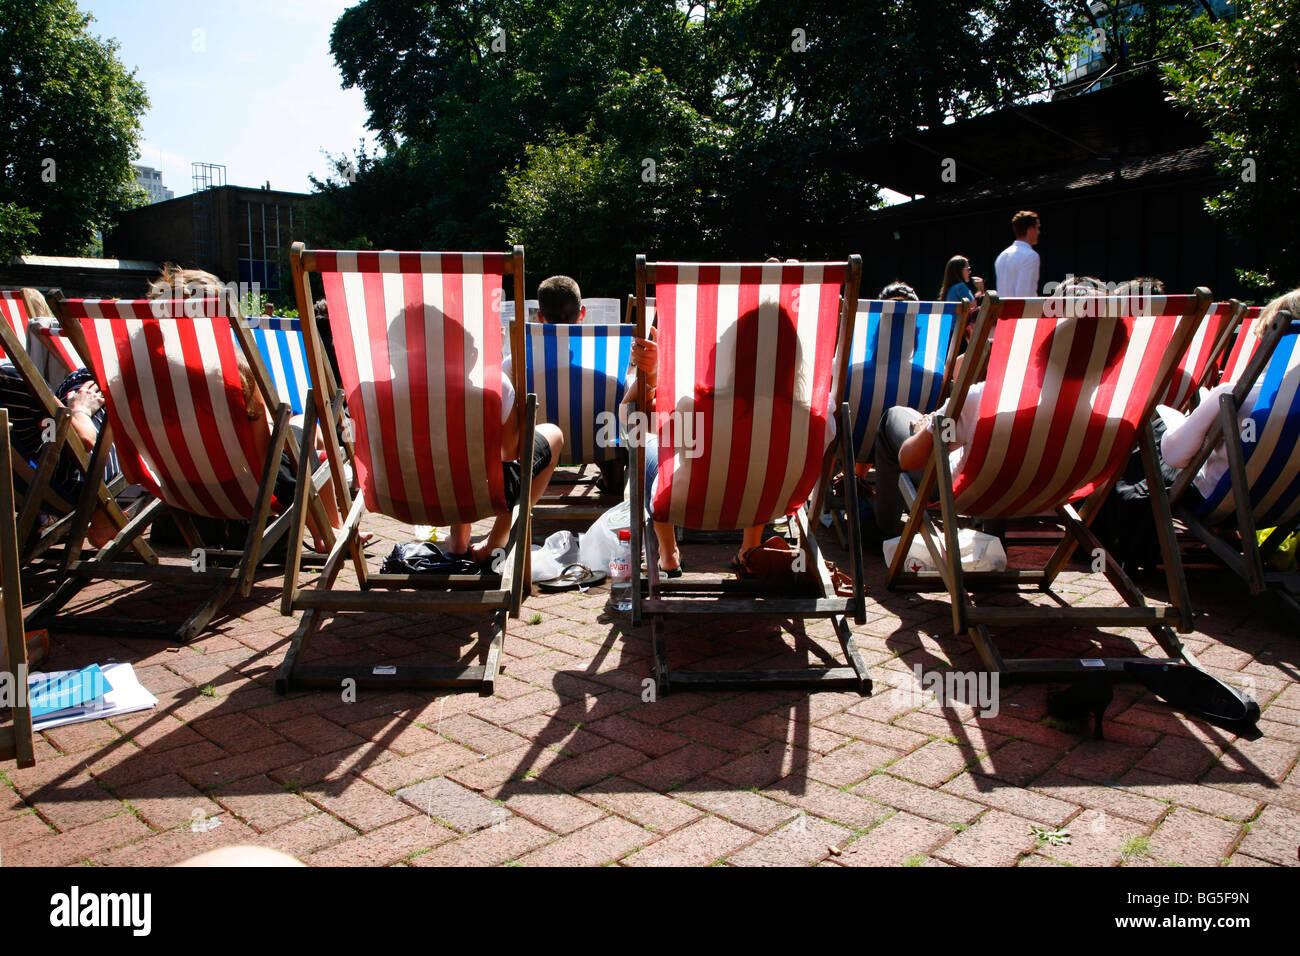 Sunbathing in deckchairs in Victoria Embankment Gardens, Charing Cross, London, UK - Stock Image